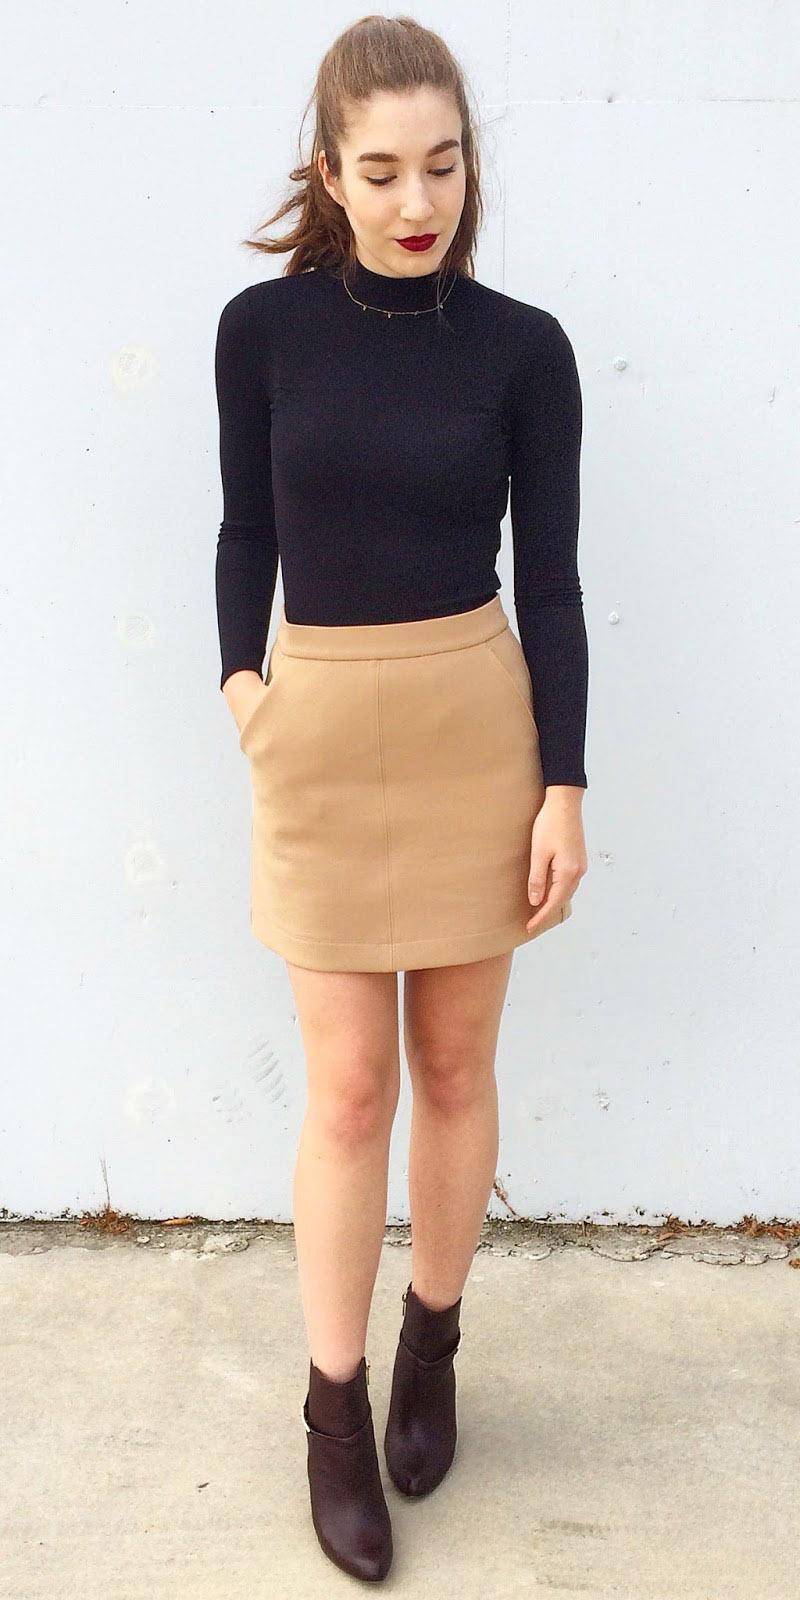 tan-mini-skirt-black-sweater-turtleneck-pony-fall-winter-hairr-lunch.JPG